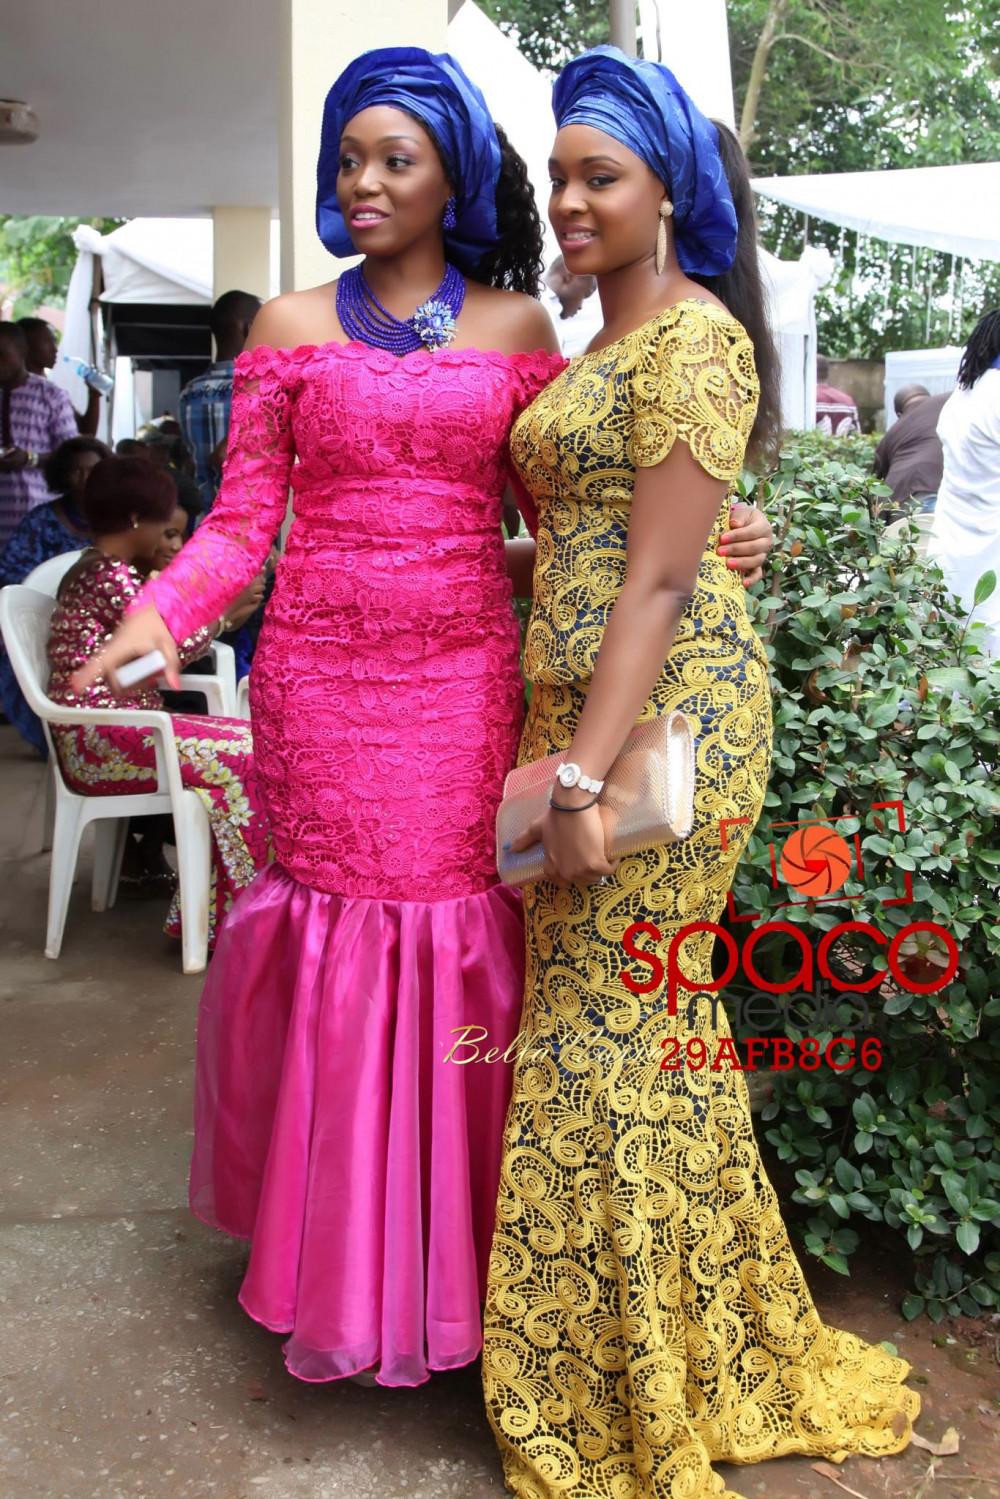 Traditional nigerian wedding dresses  Deborah HolmesWilliams debbiehw on Pinterest